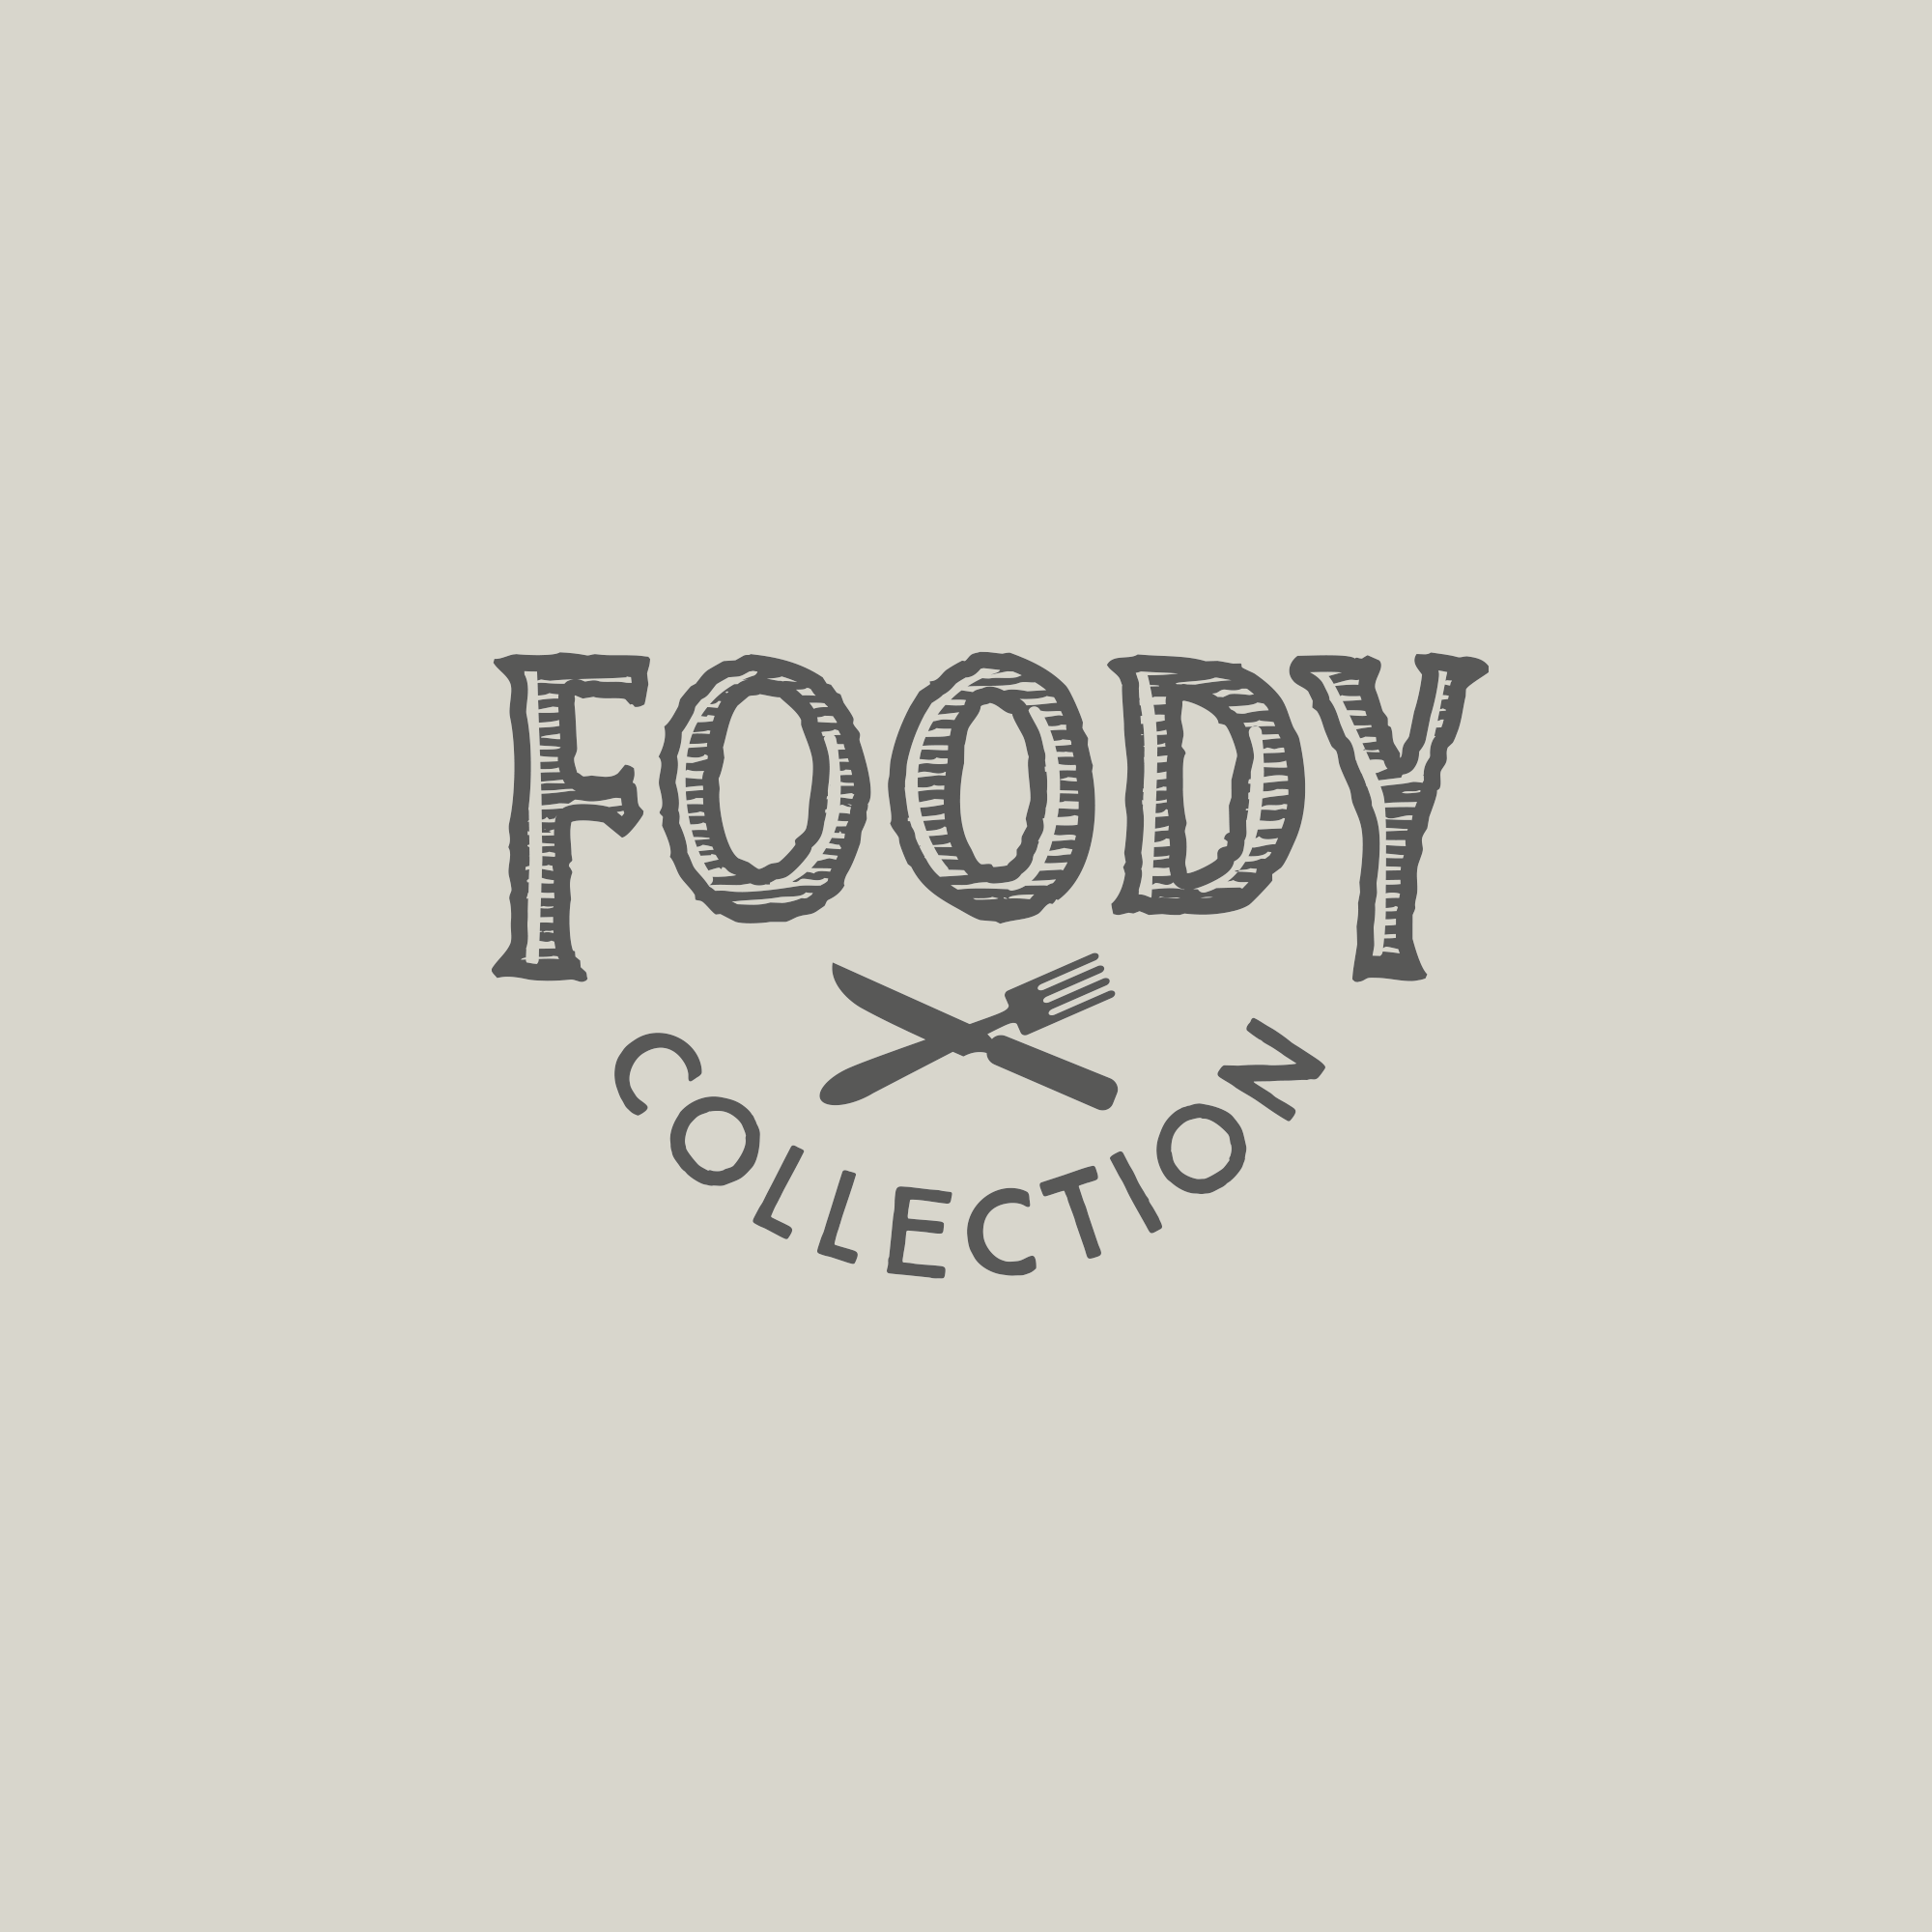 Foody_02